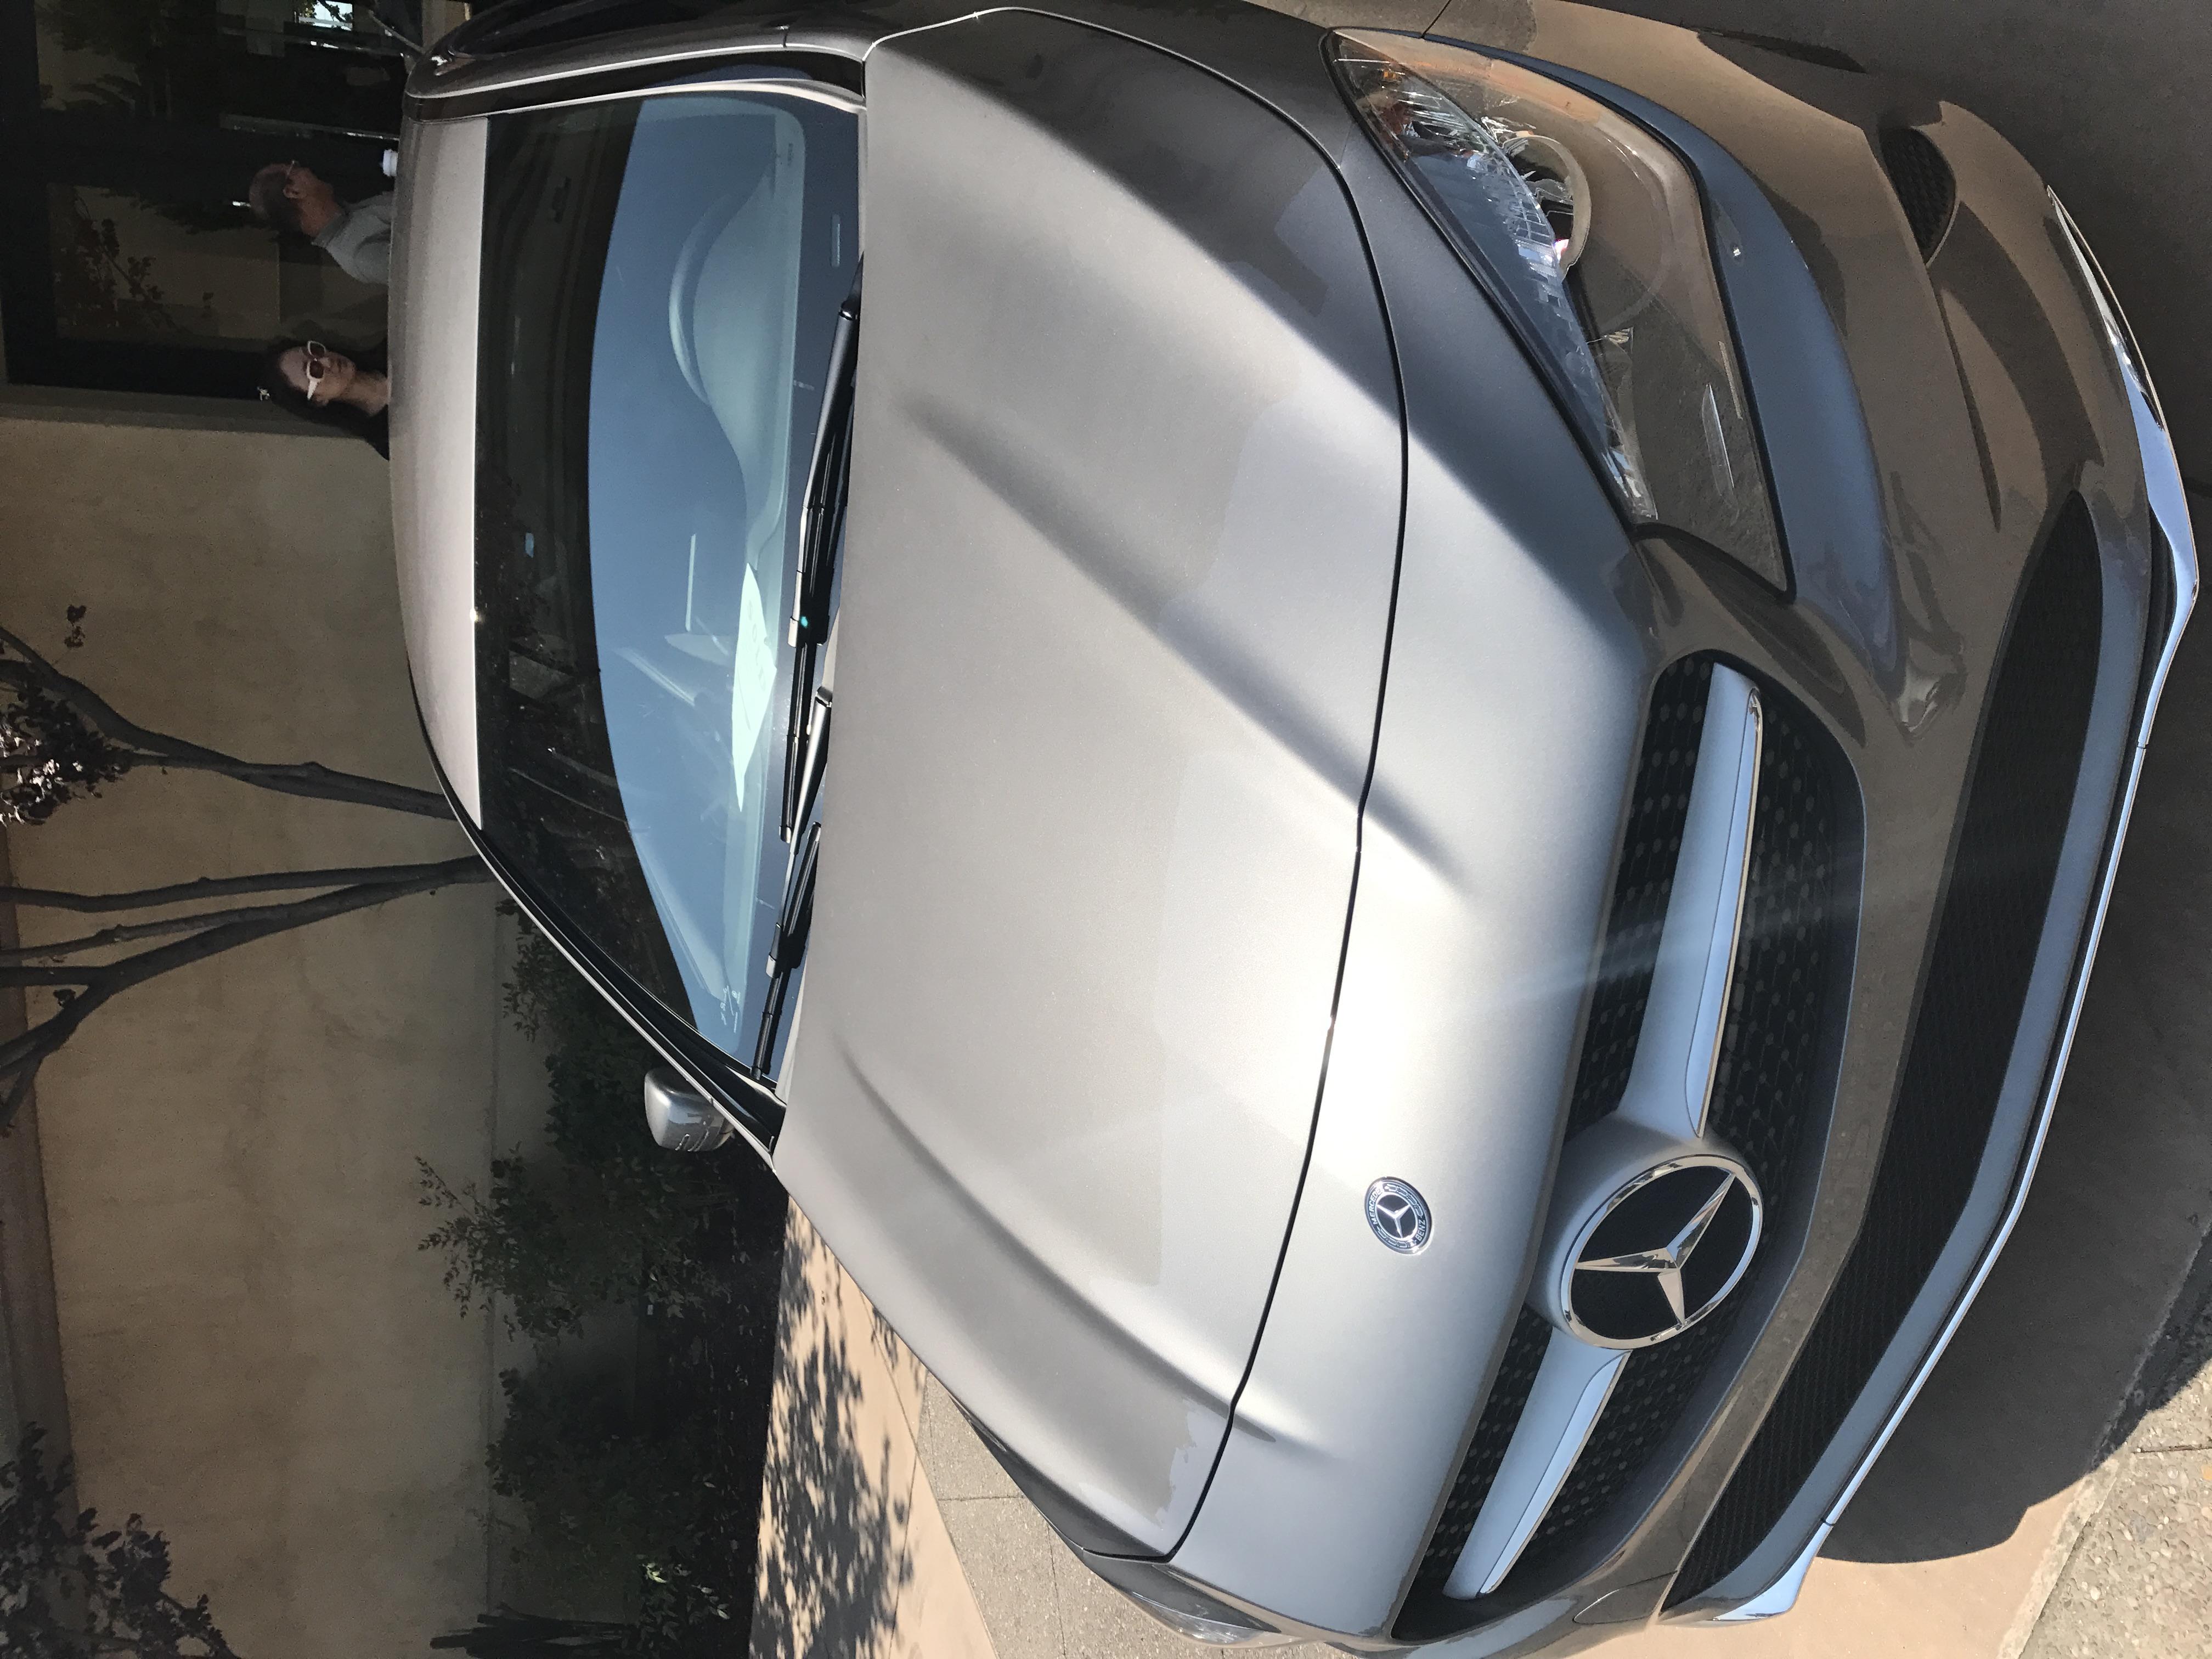 2018 CLA 250 modifications